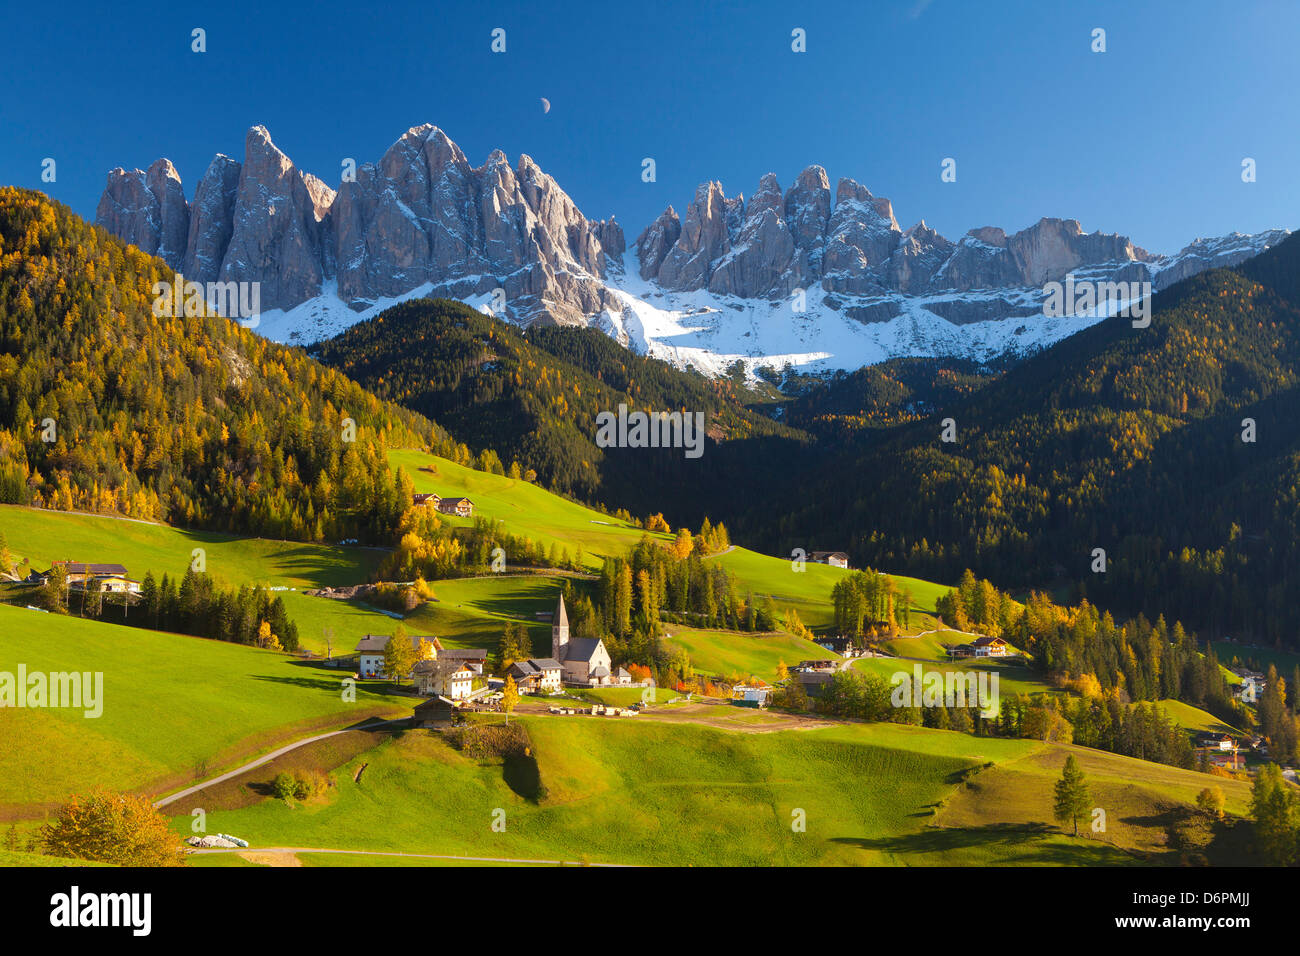 St. Magdalena, Val di Funes, Trentino-Alto Adige, Dolomites, South Tyrol, Italy, Europe - Stock Image